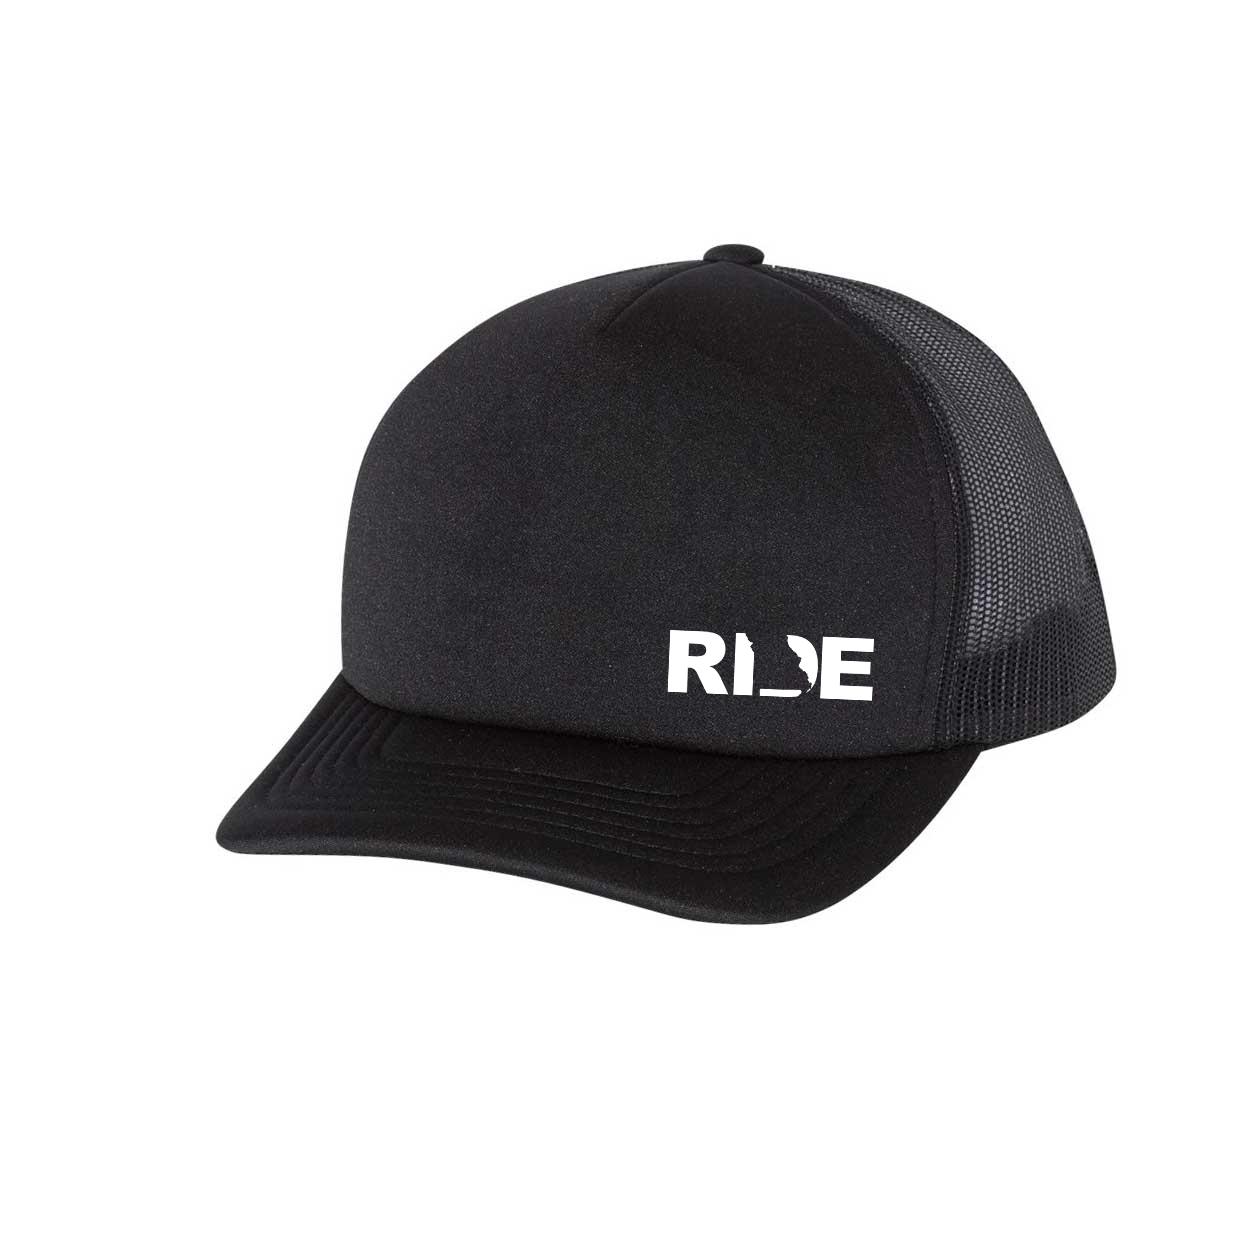 Ride Missouri Night Out Premium Foam Trucker Snapback Hat Black (White Logo)